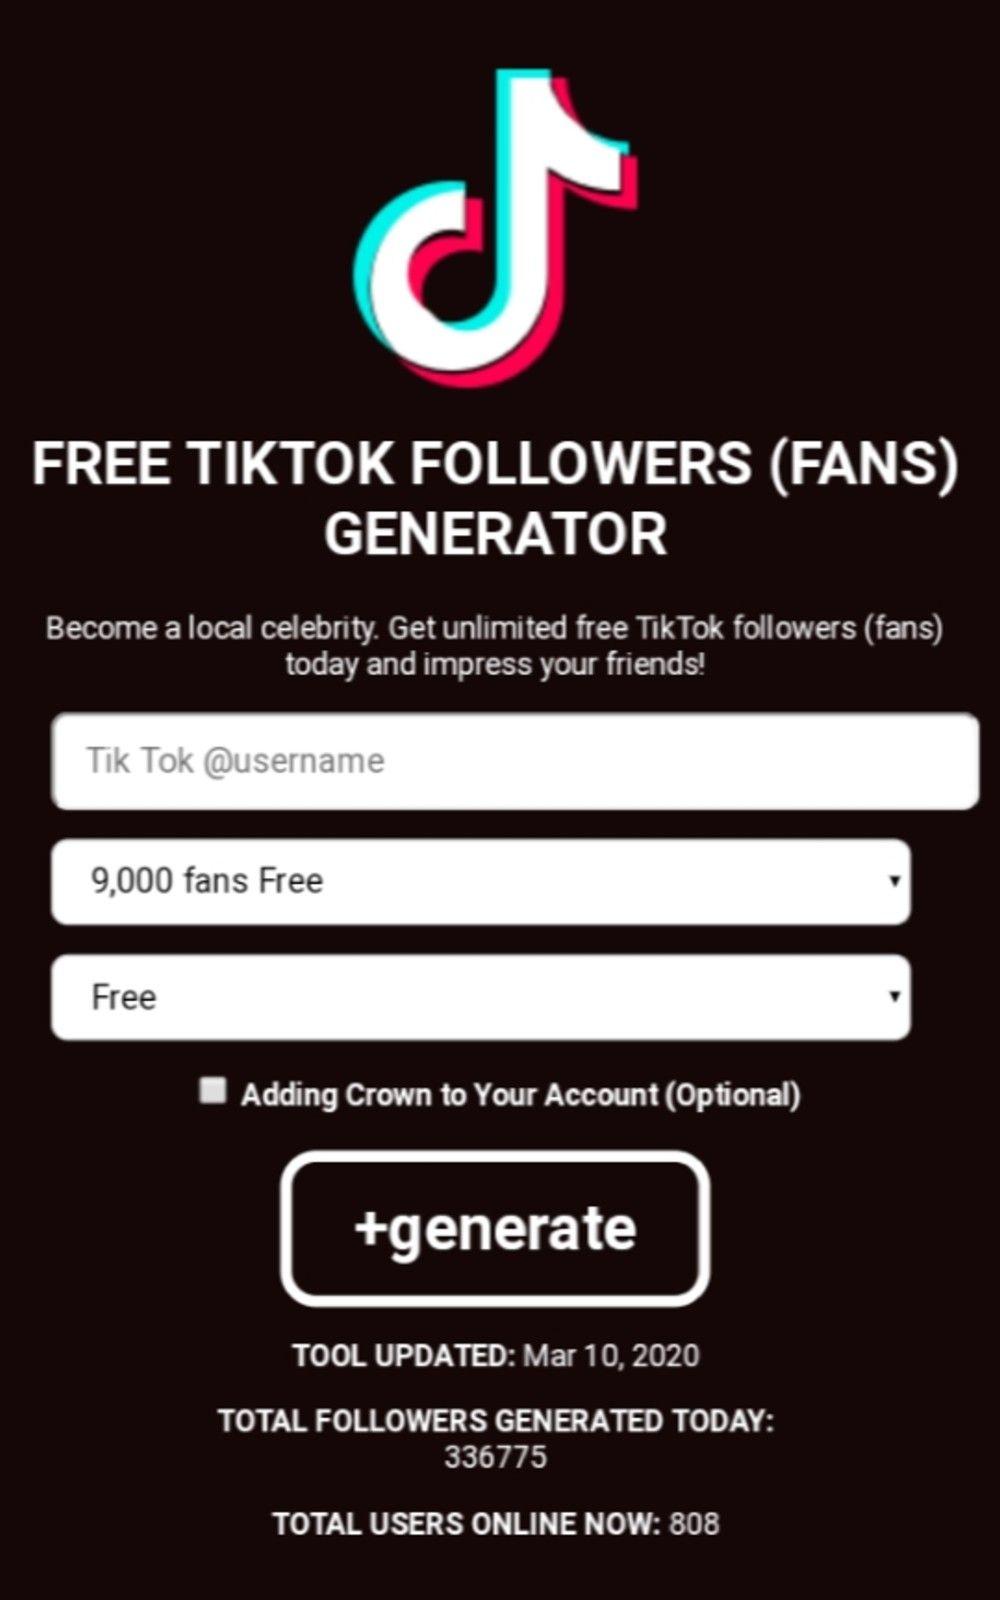 Free Tiktok Followers Fans Generator How To Get Followers Free Followers How To Get Famous